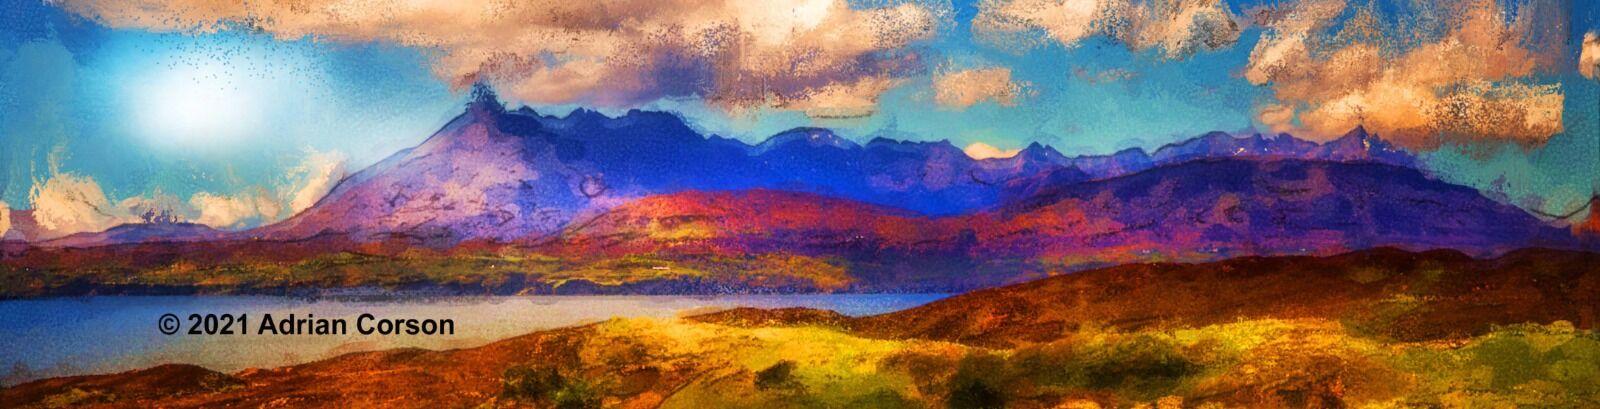 194-jagged mountain skyline